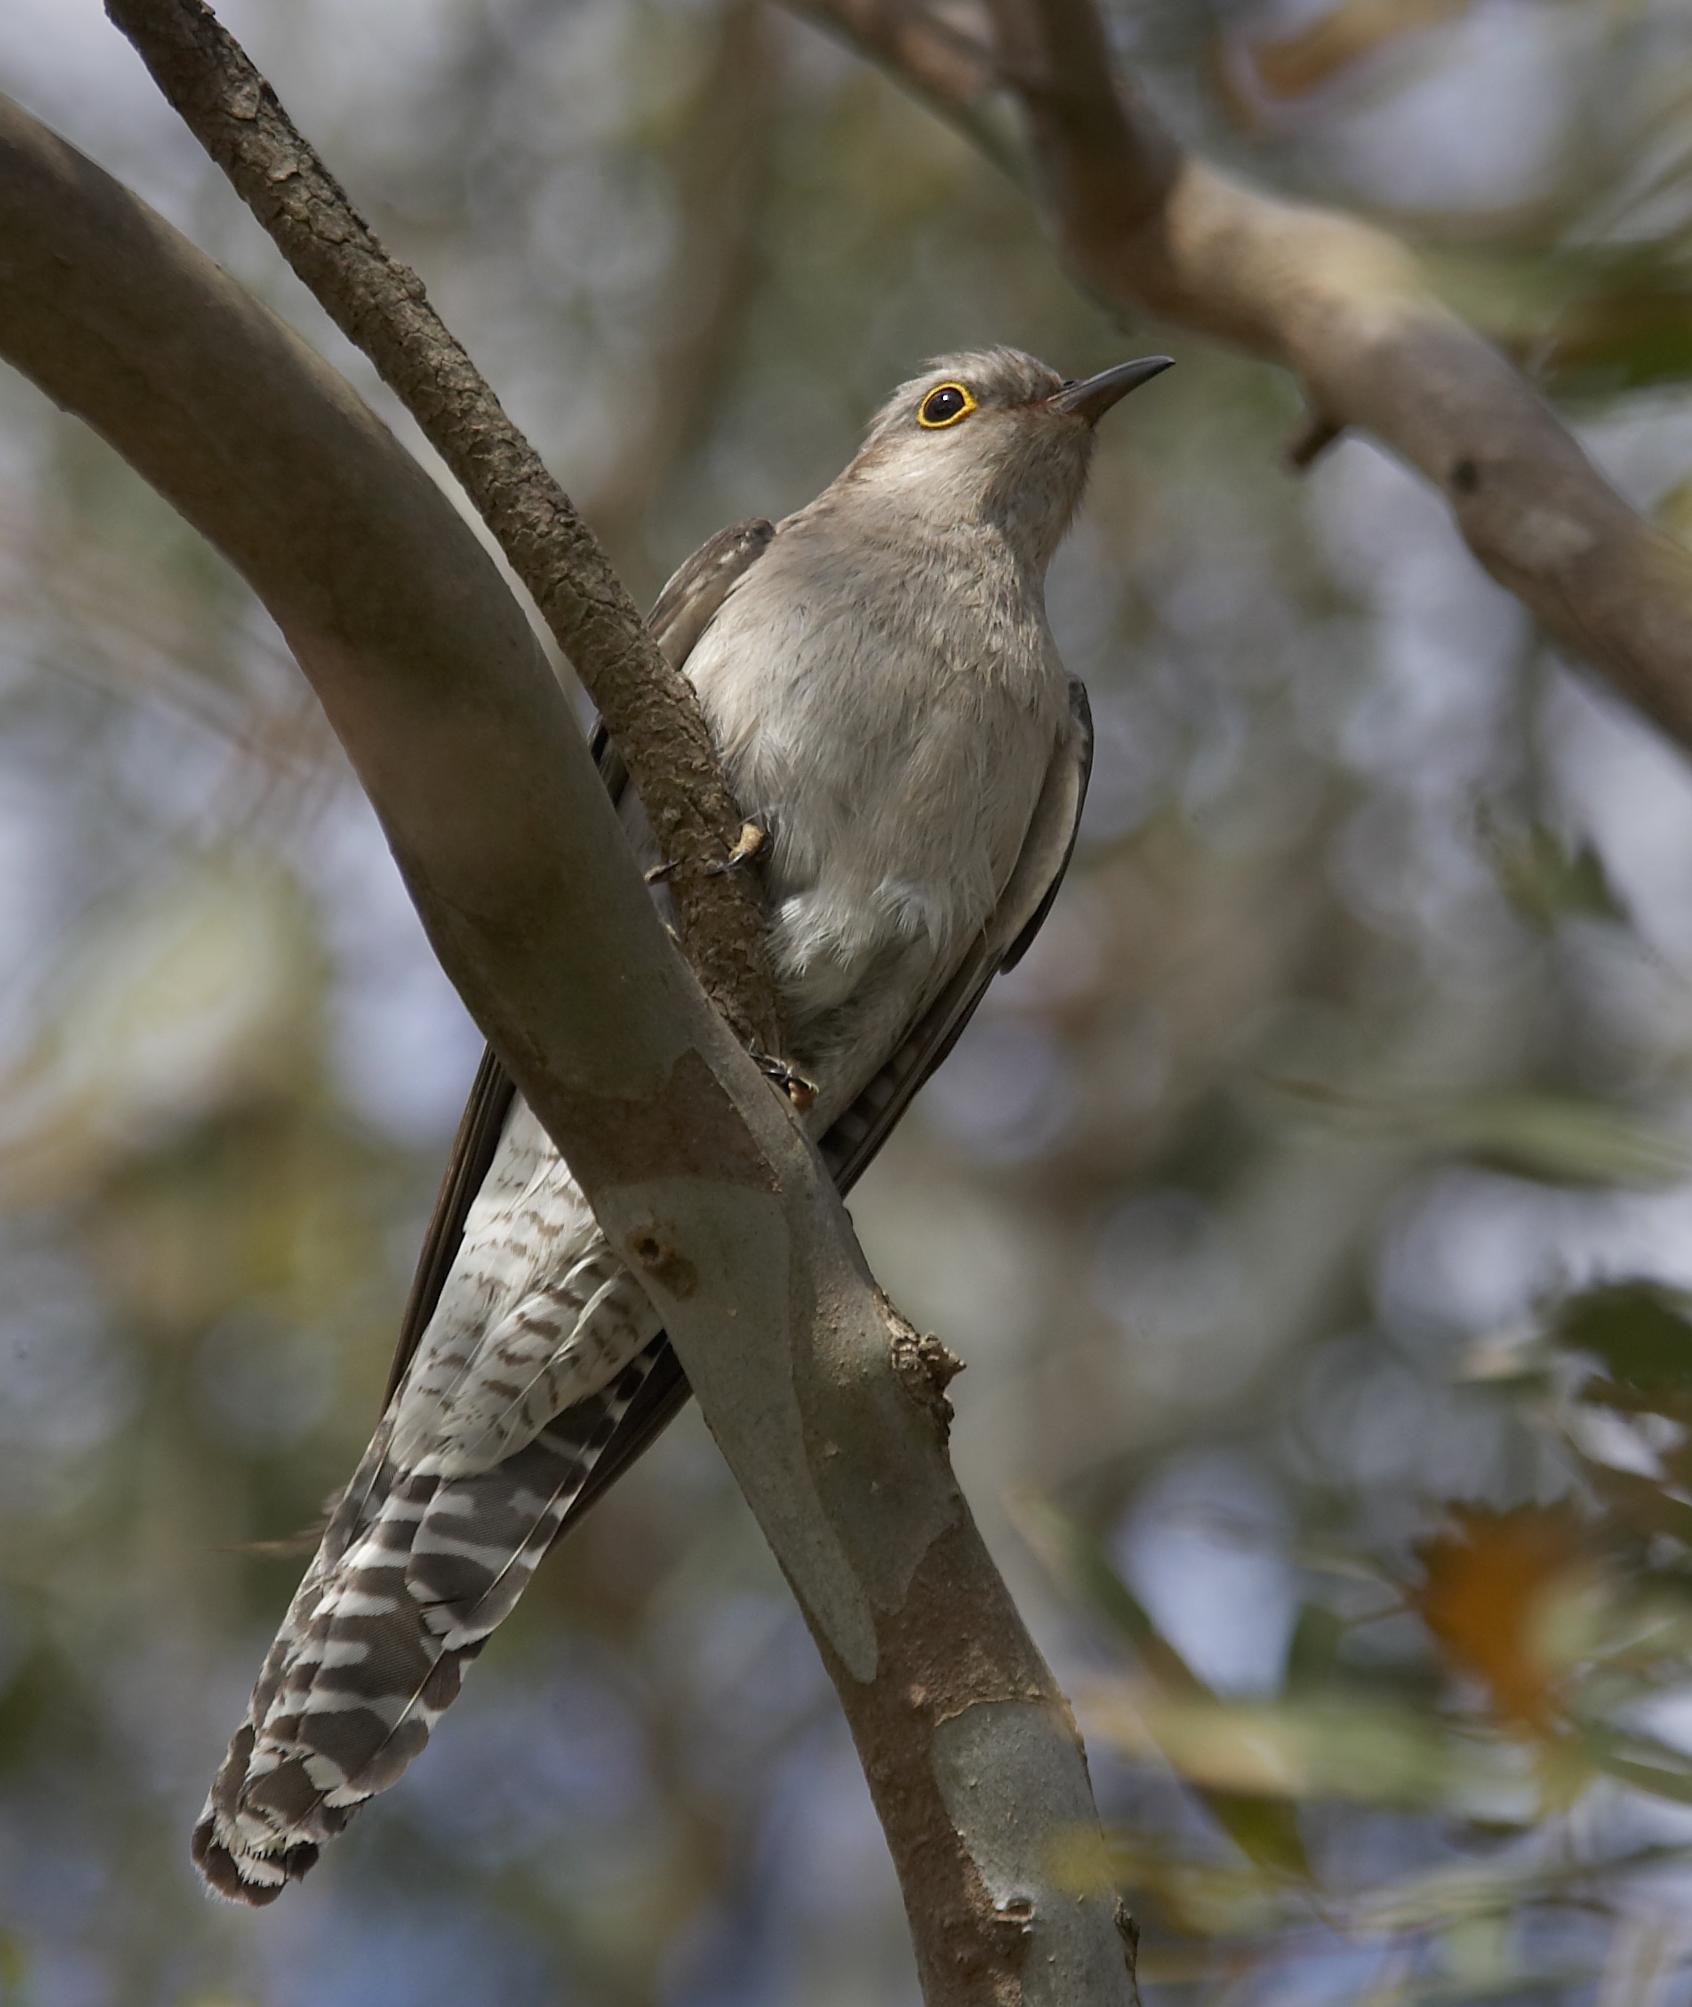 Pallid cuckoo. adult. gippsland, victoria, australia, october 2007